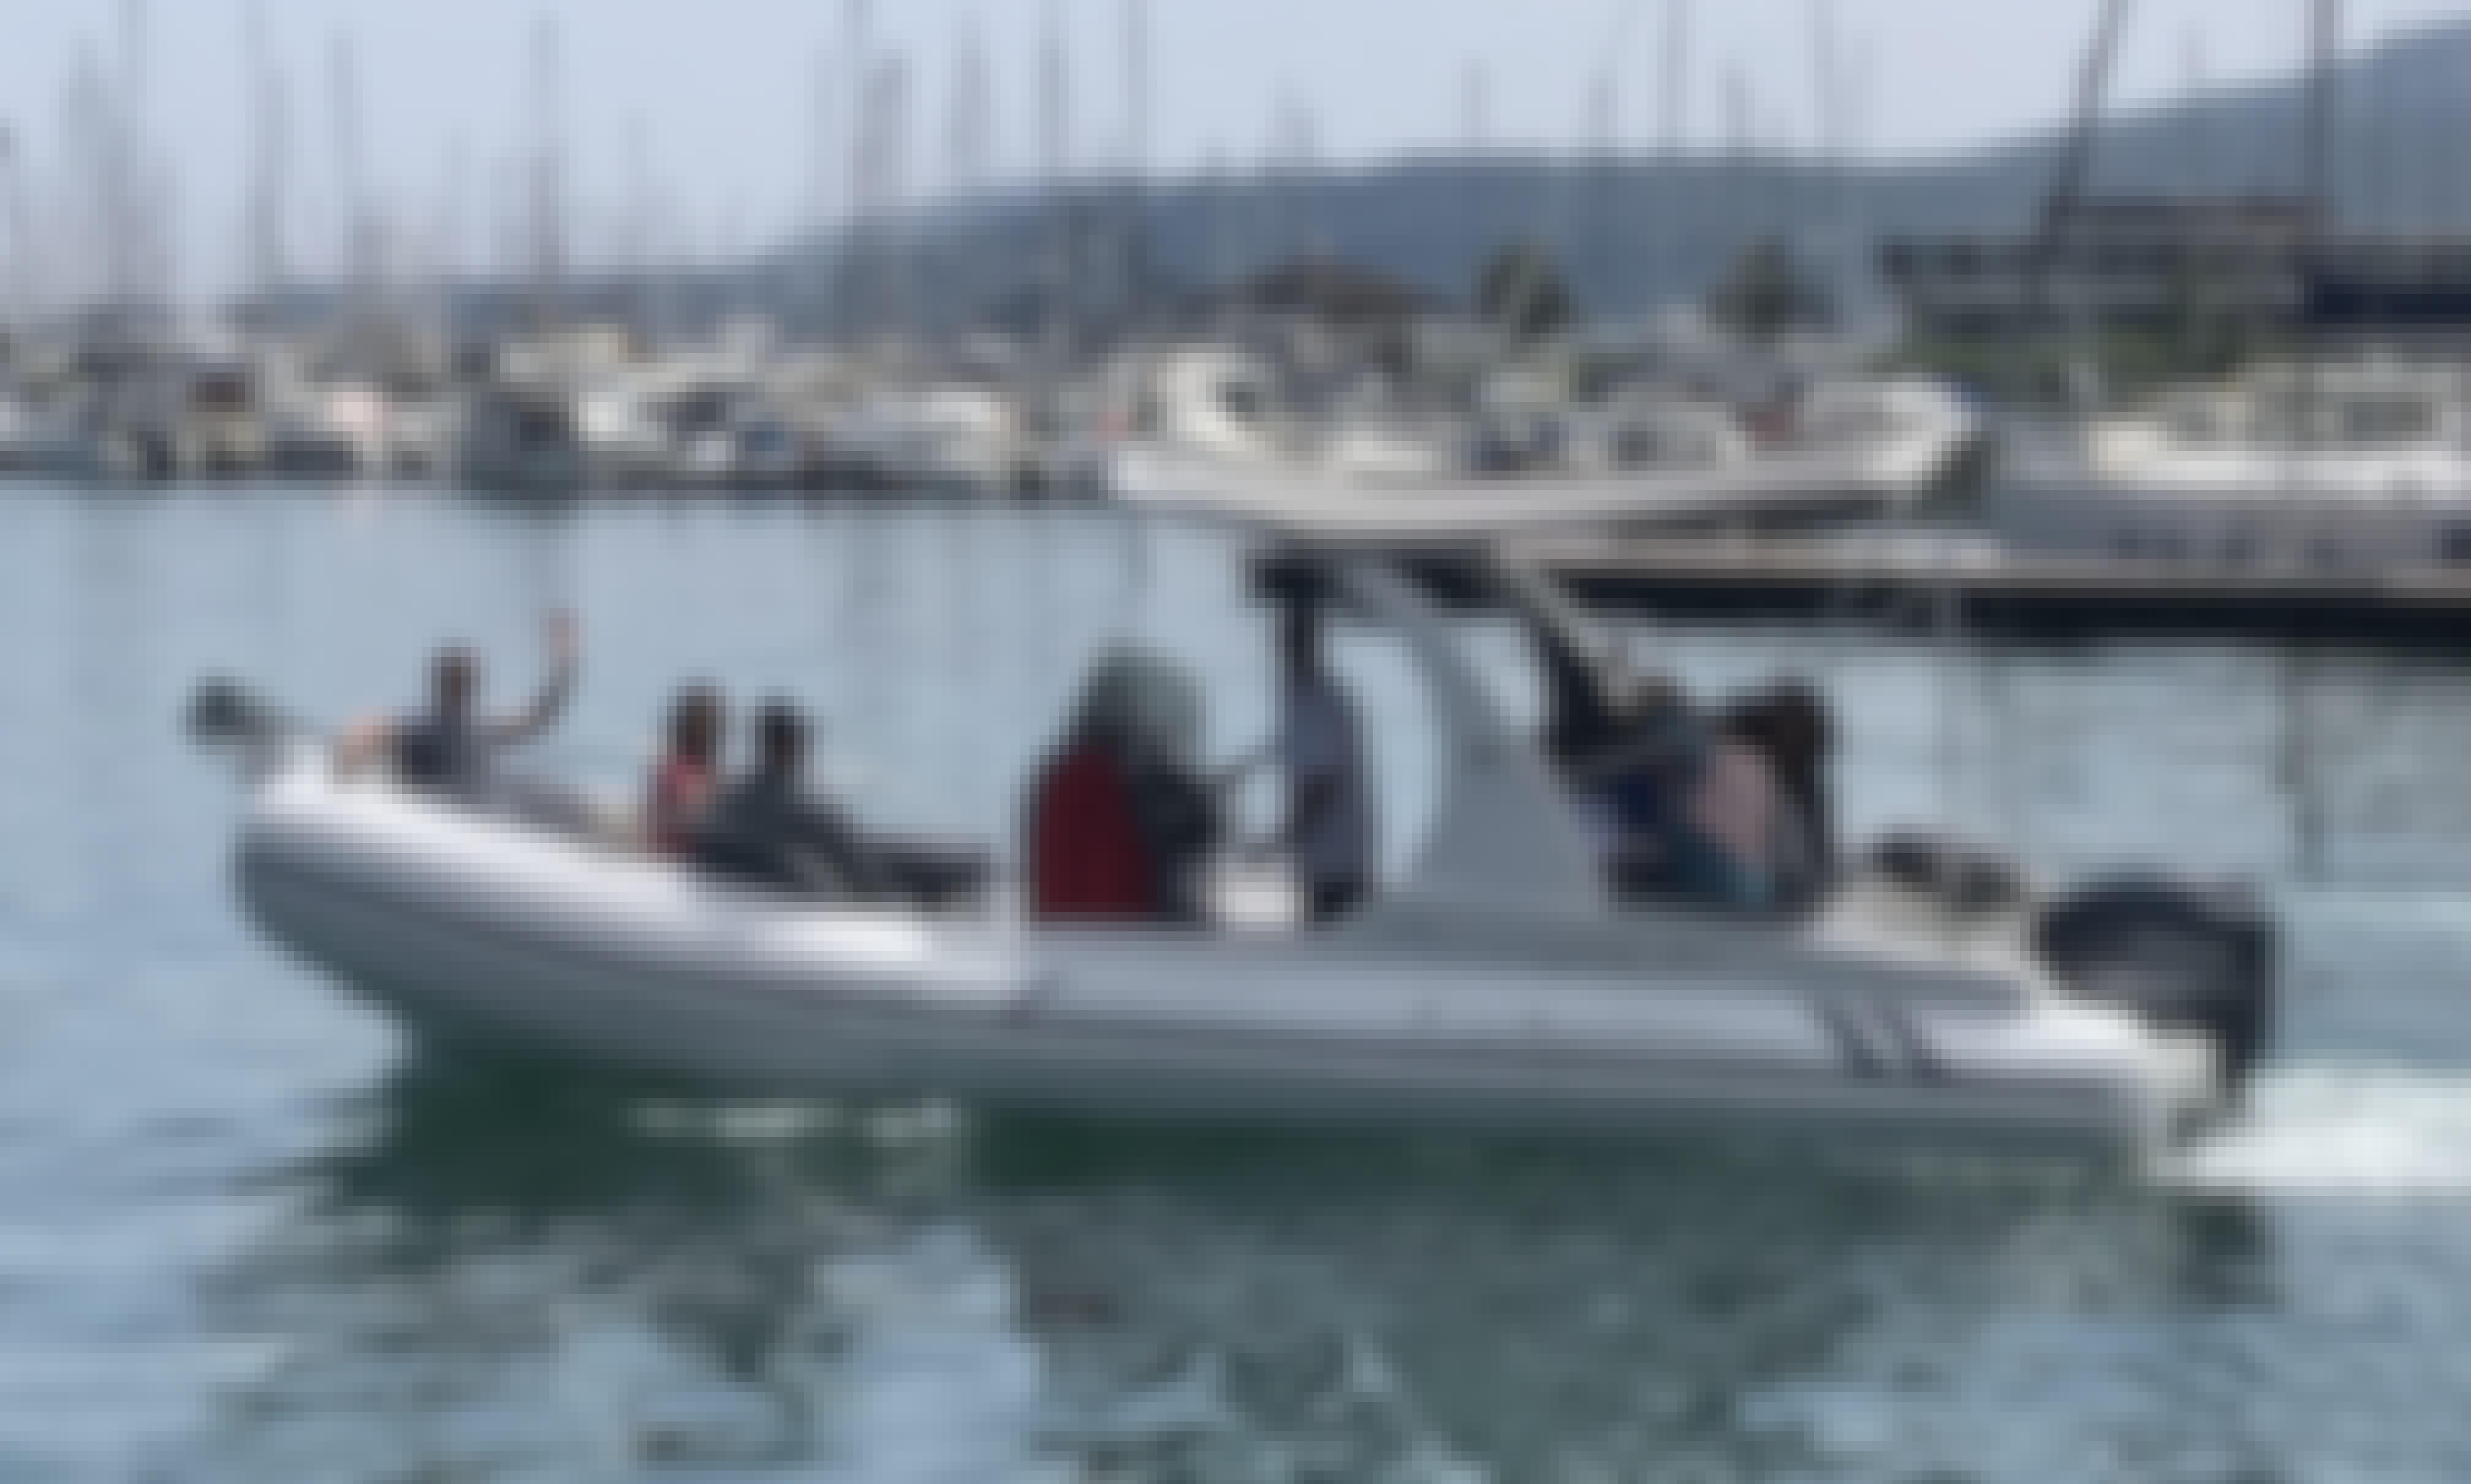 Cinque Terre Tour - Revenger 24 RIB Rental for 8 People in La Spezia, Italy